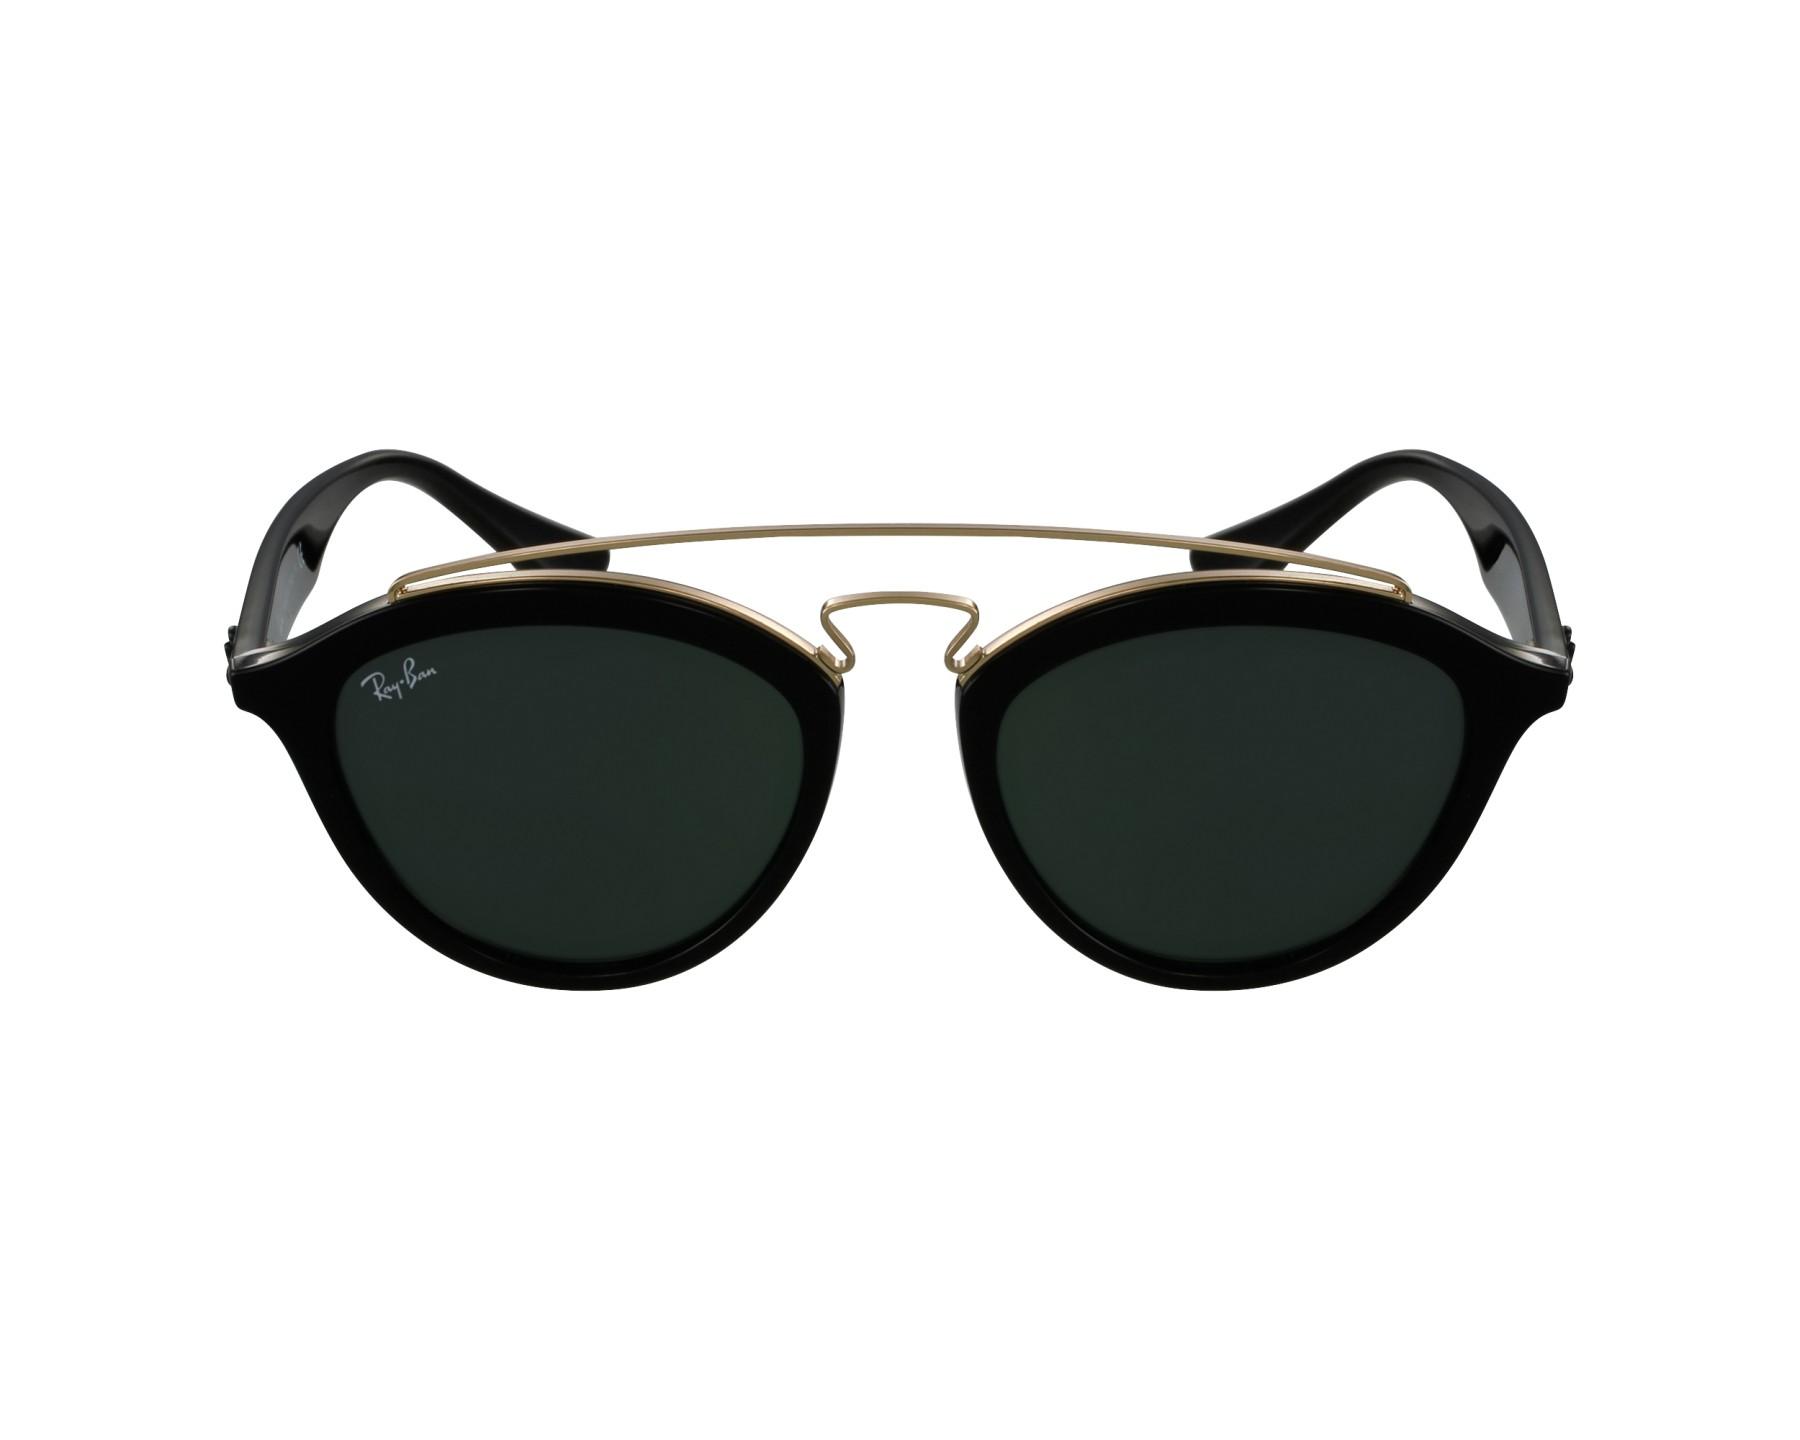 35ecb4e7280 Sunglasses Ray-Ban RB-4257 601 71 53-19 Black Gold profile